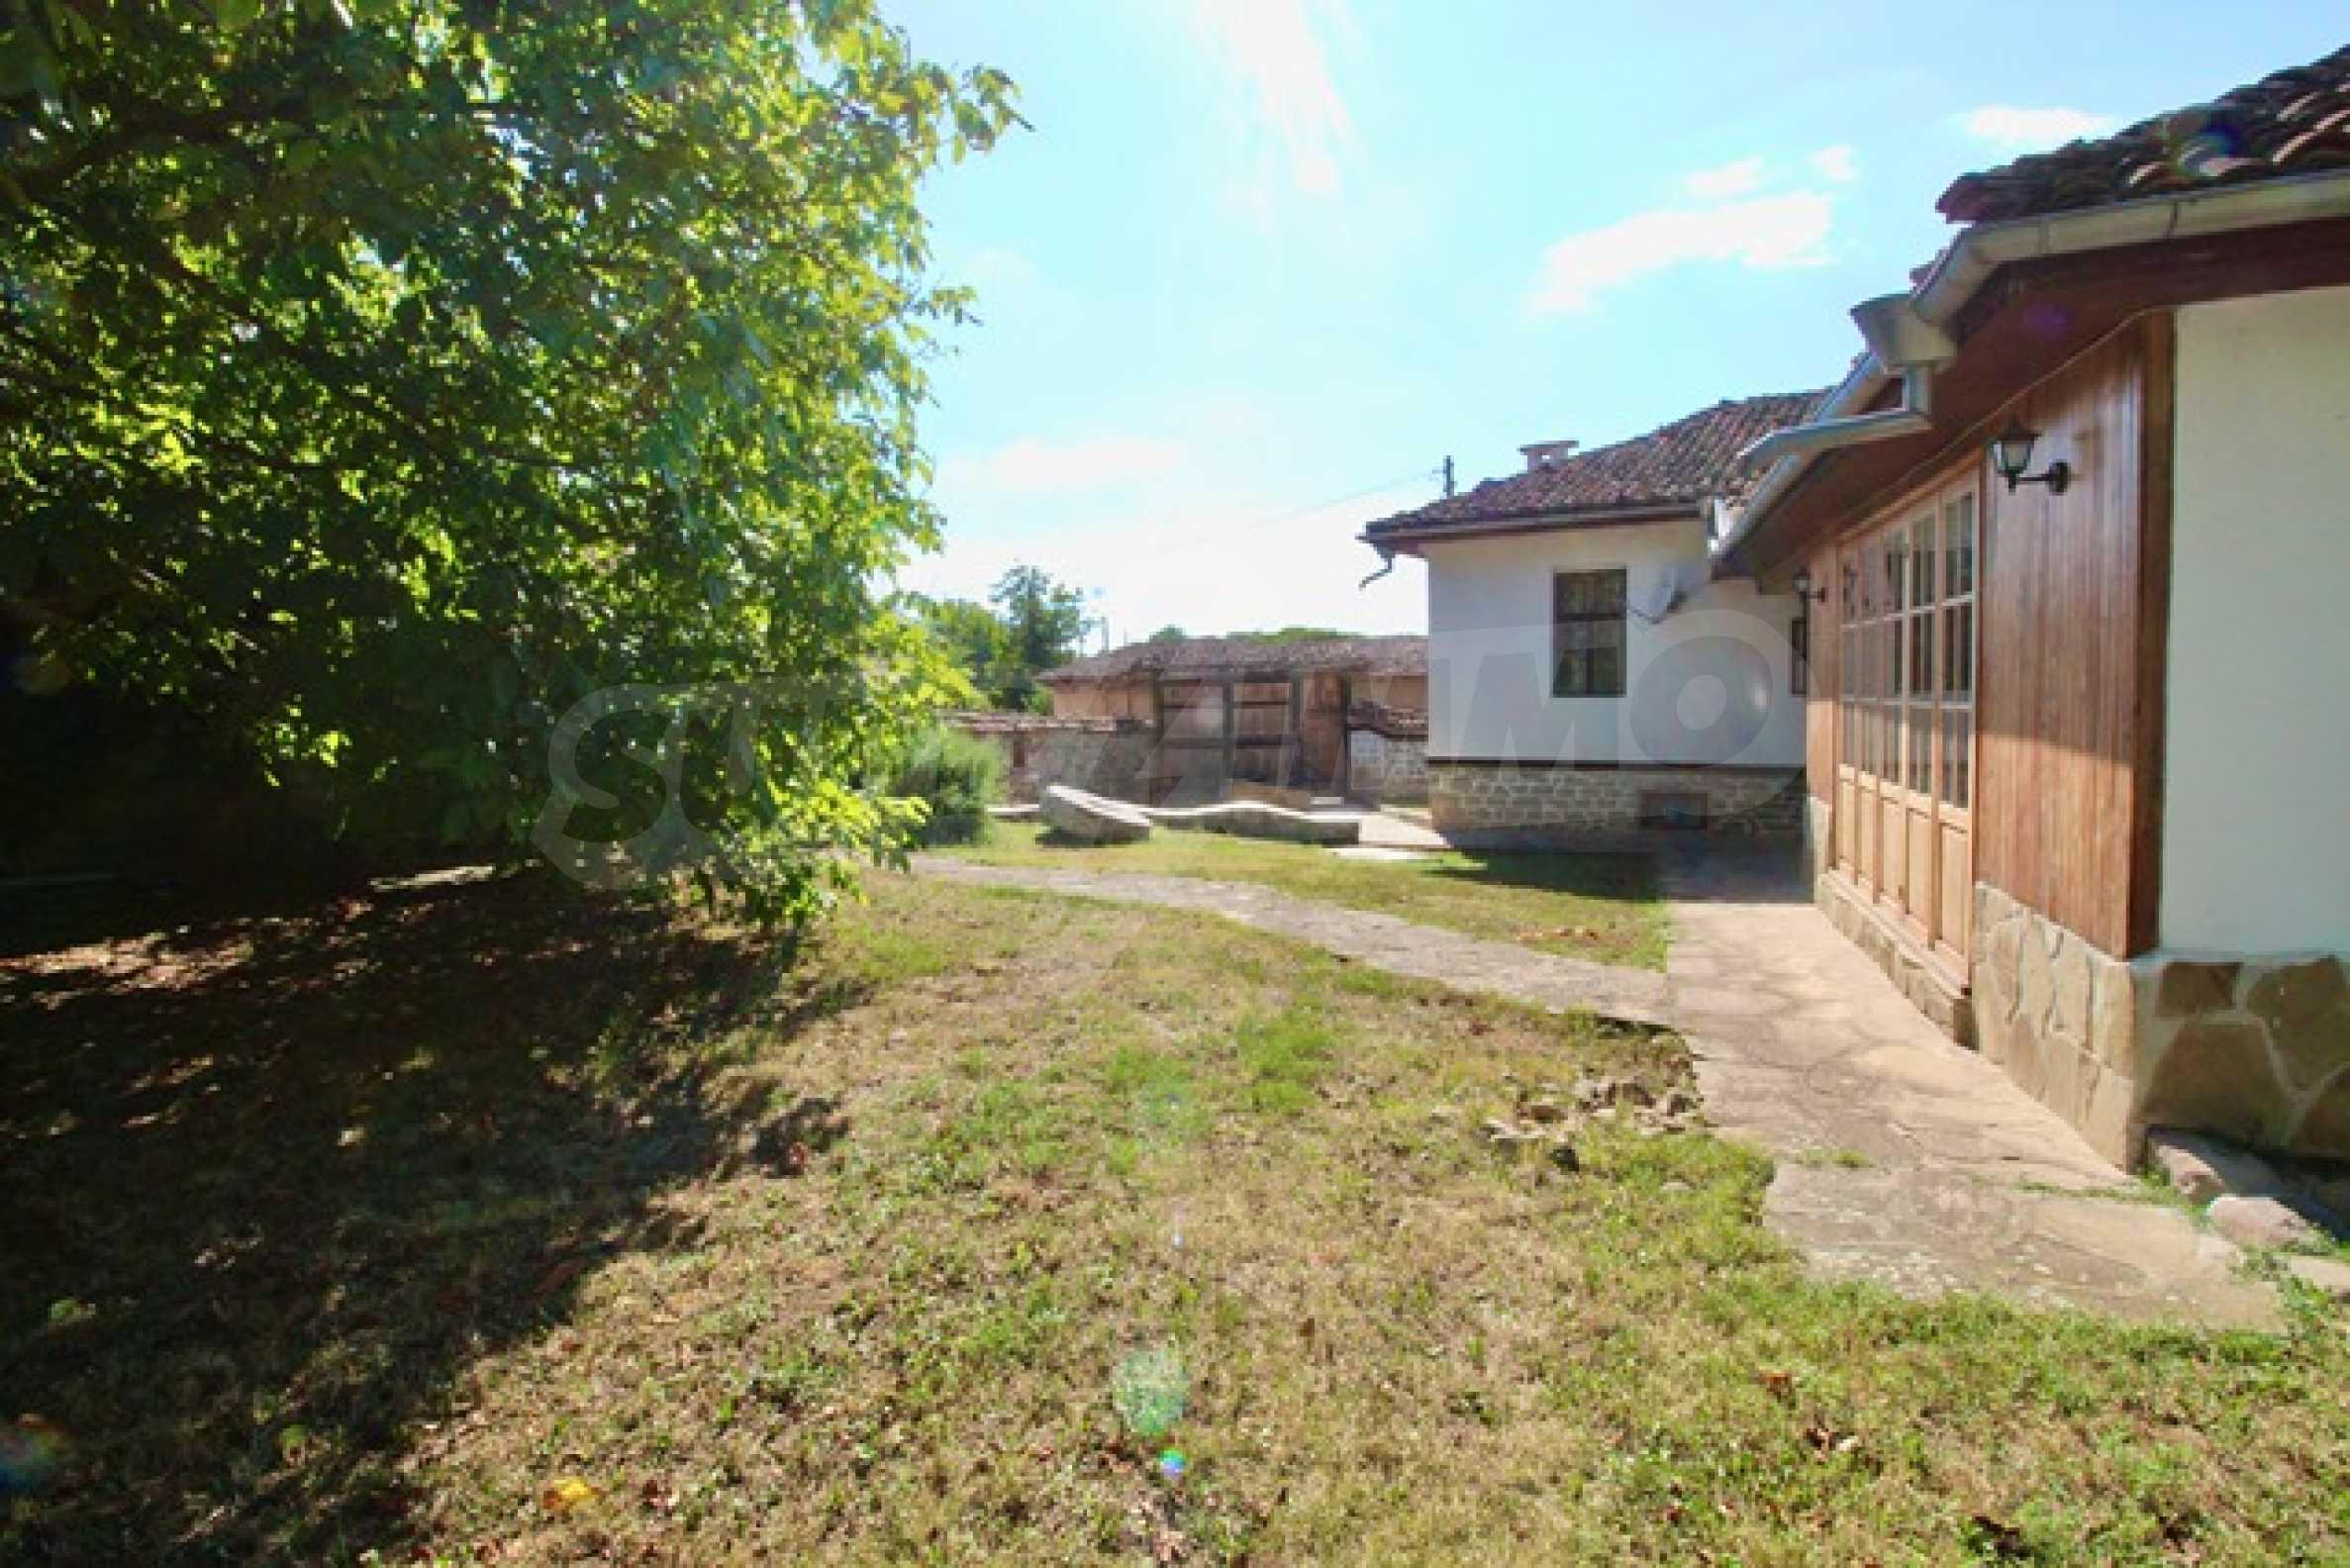 Lovely old house just 17 km away from Veliko Tarnovo 19